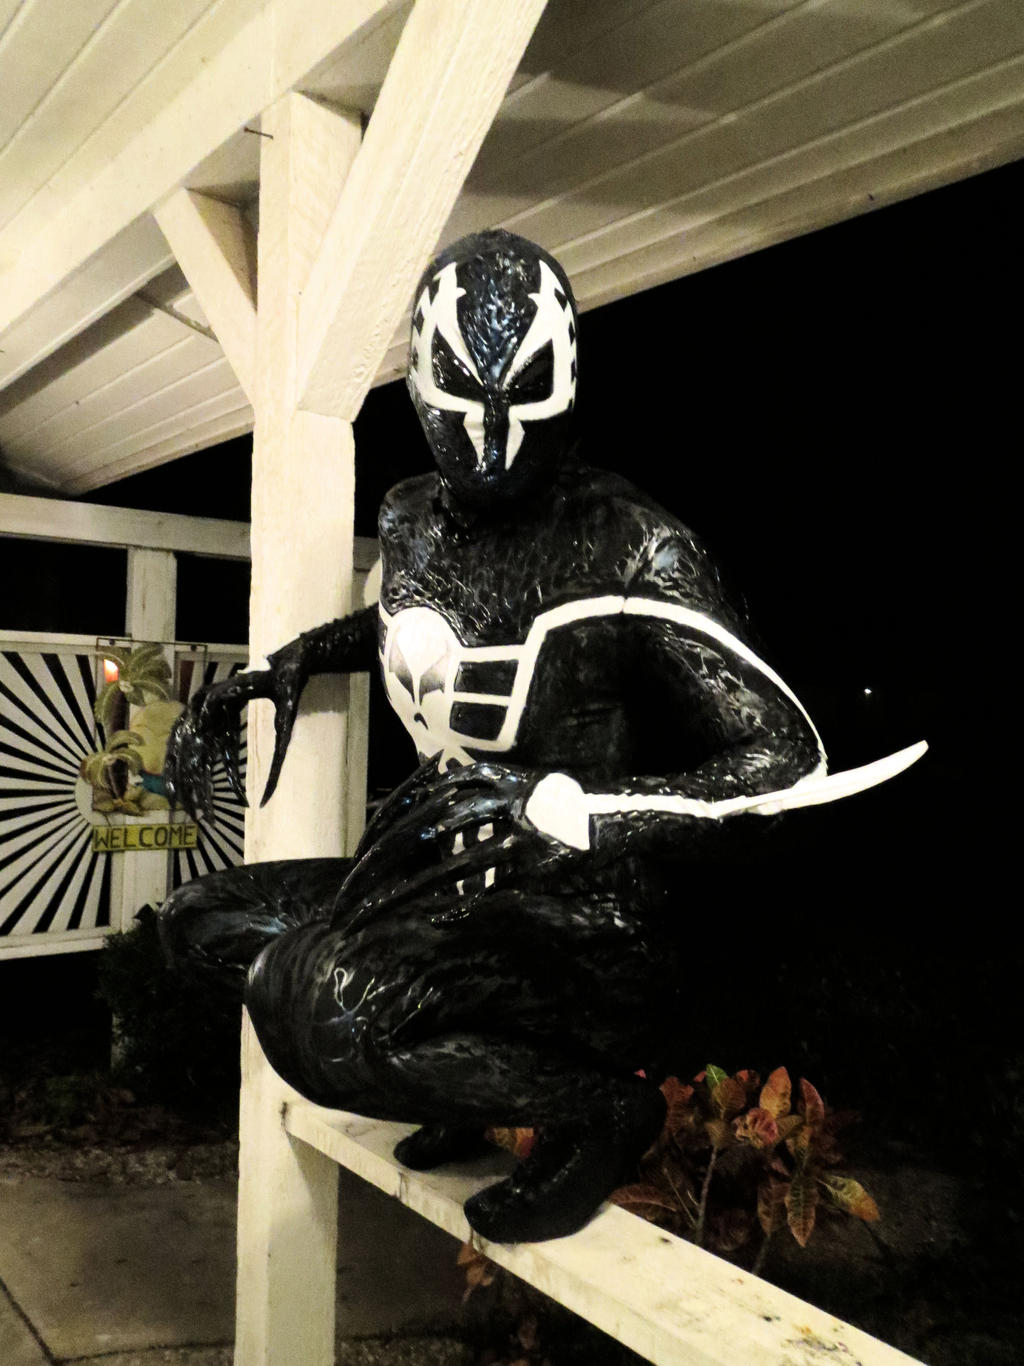 SYMBIOTE SPIDERMAN 2099 COSTUME by symbiote-x